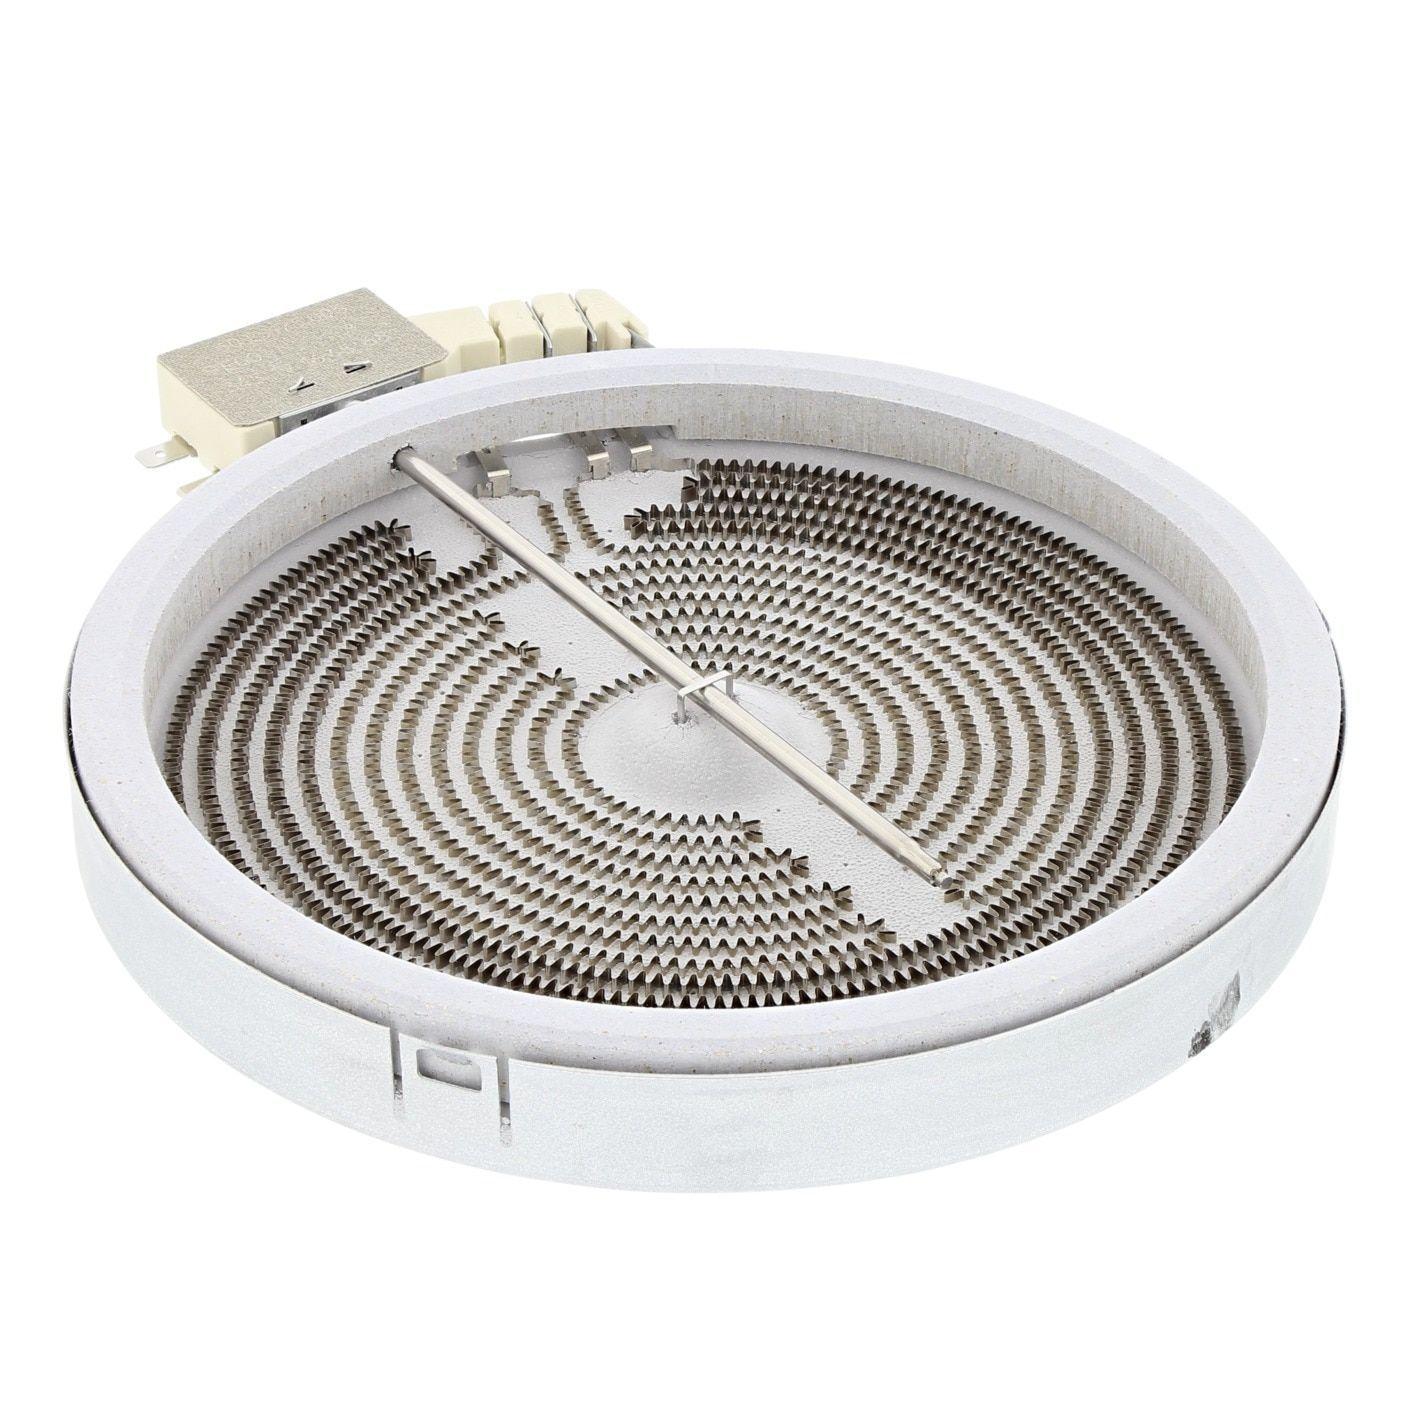 Hotplate Element for AEG Electrolux Zanussi Hobs - 3740754217 AEG / Electrolux / Zanussi